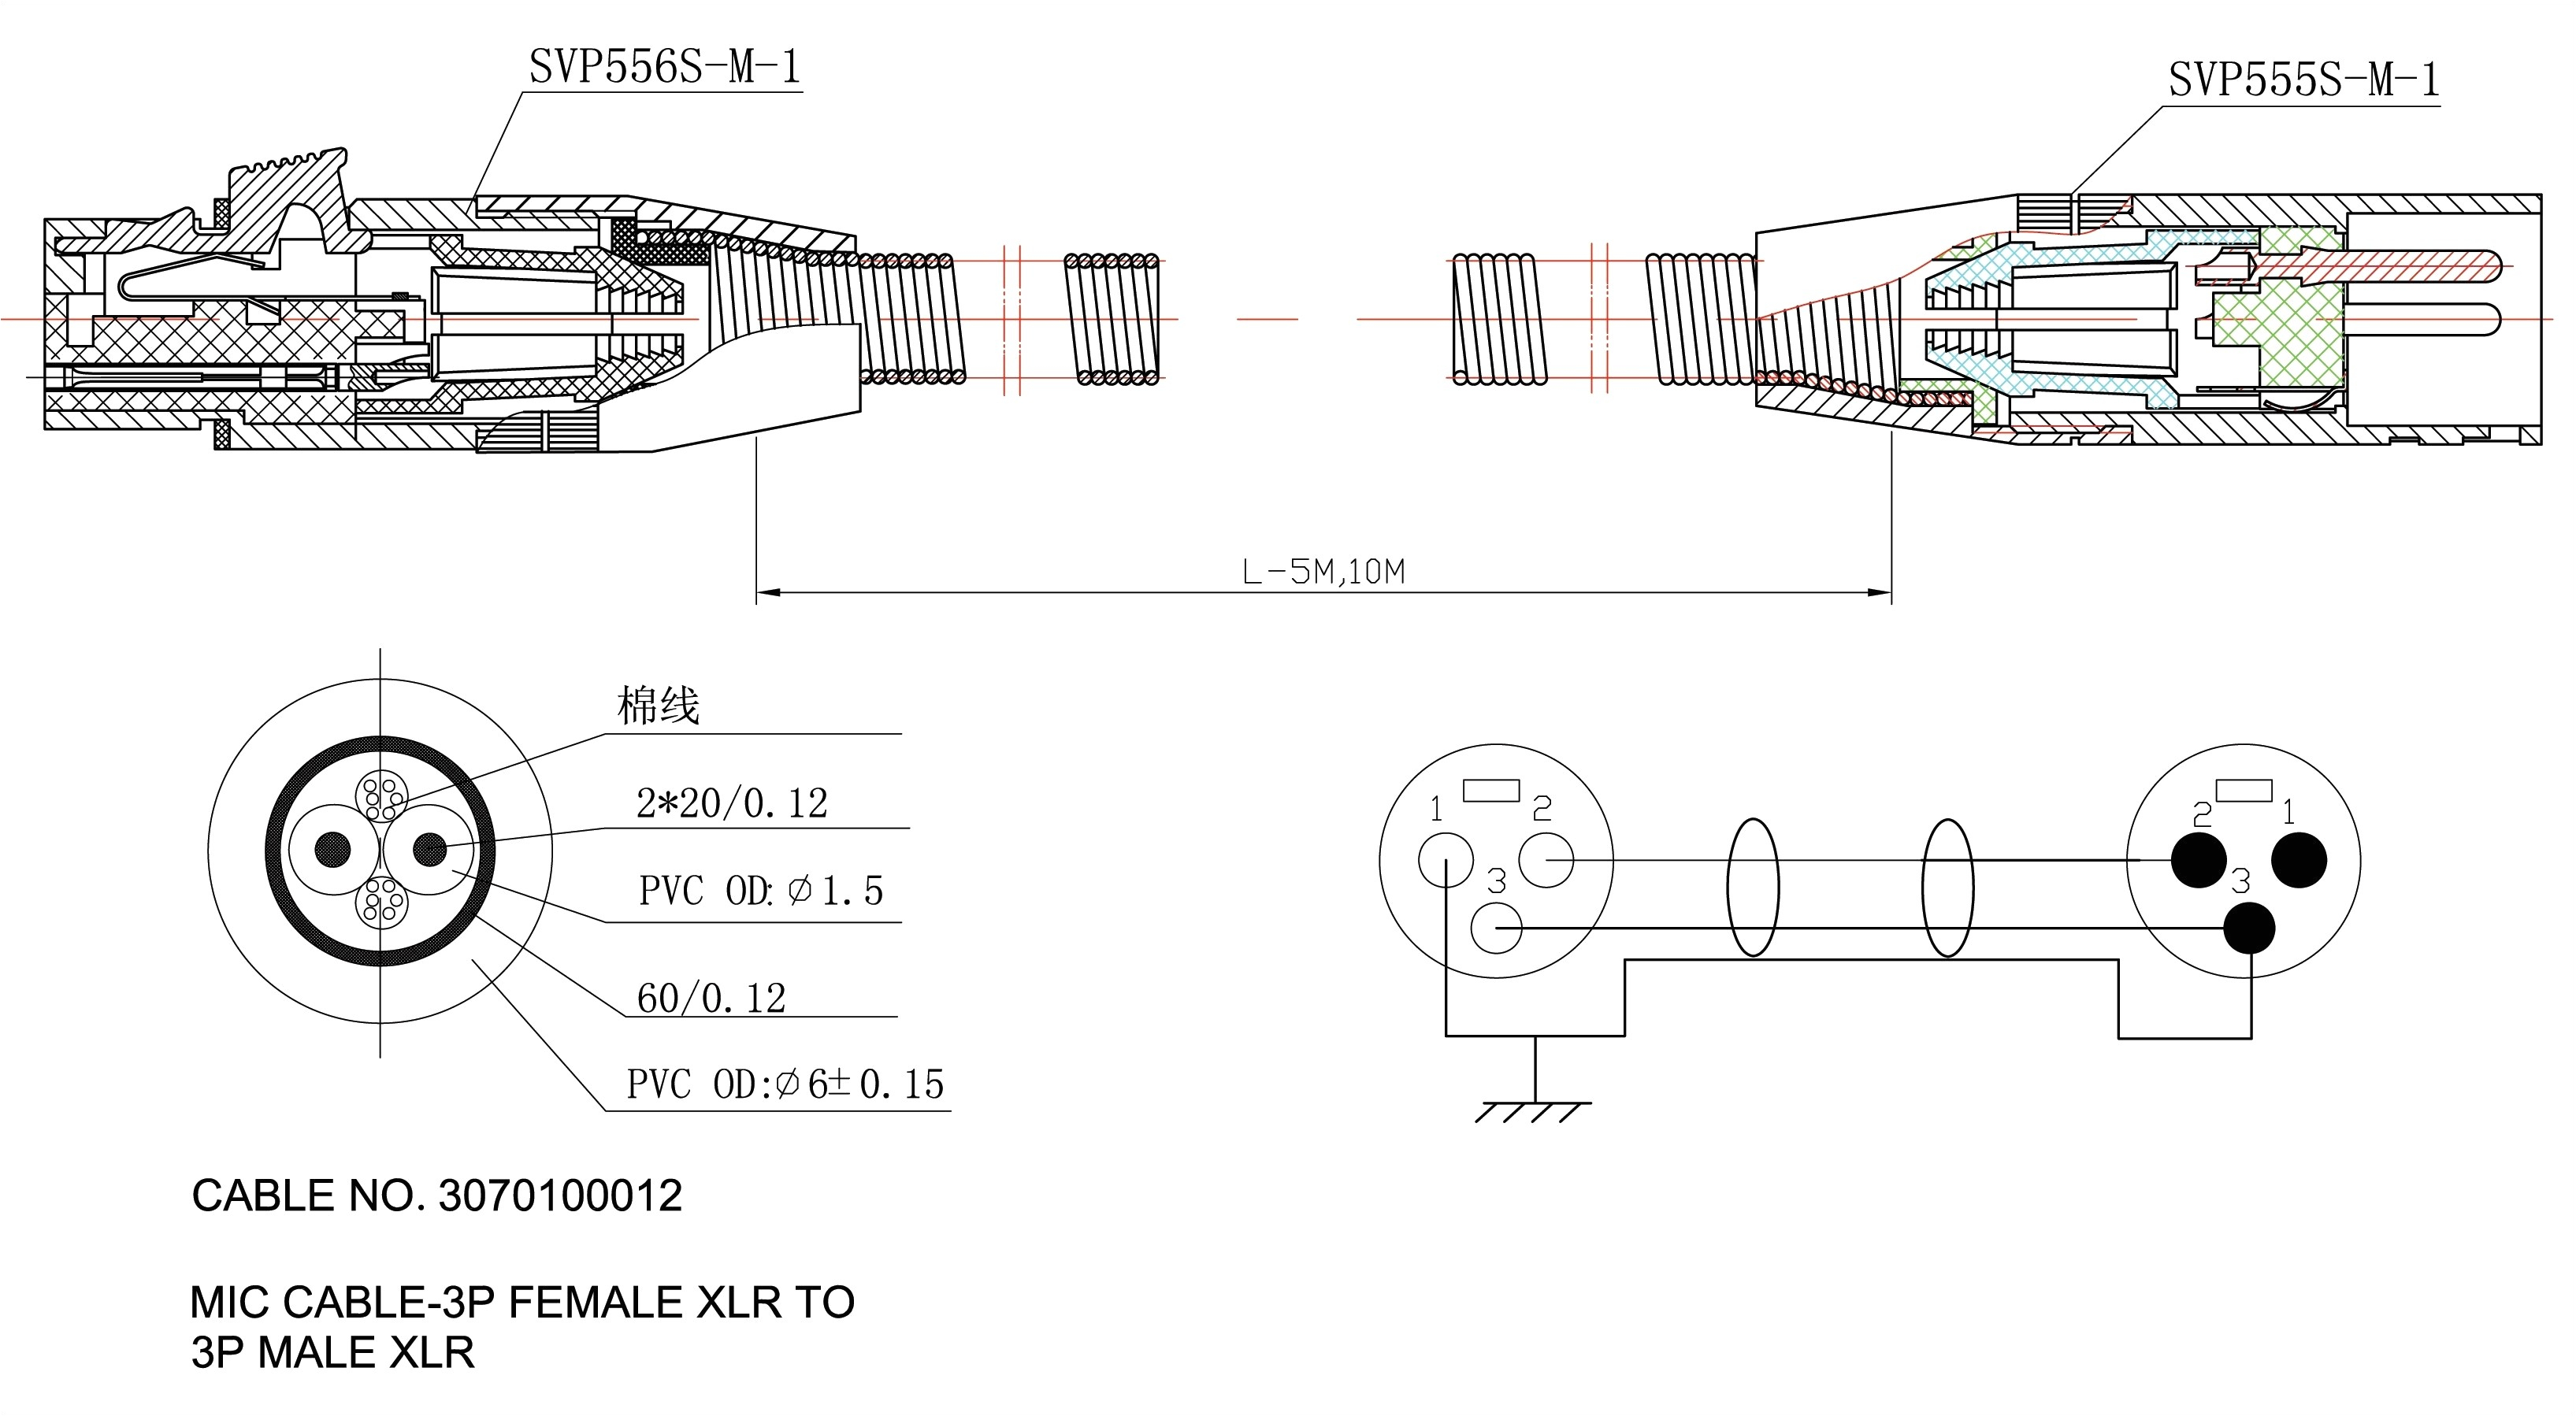 luxury rj45 wall socket wiring diagram cloudmining promo netcat6 keystone wiring diagram awesome cat5e jack beautiful